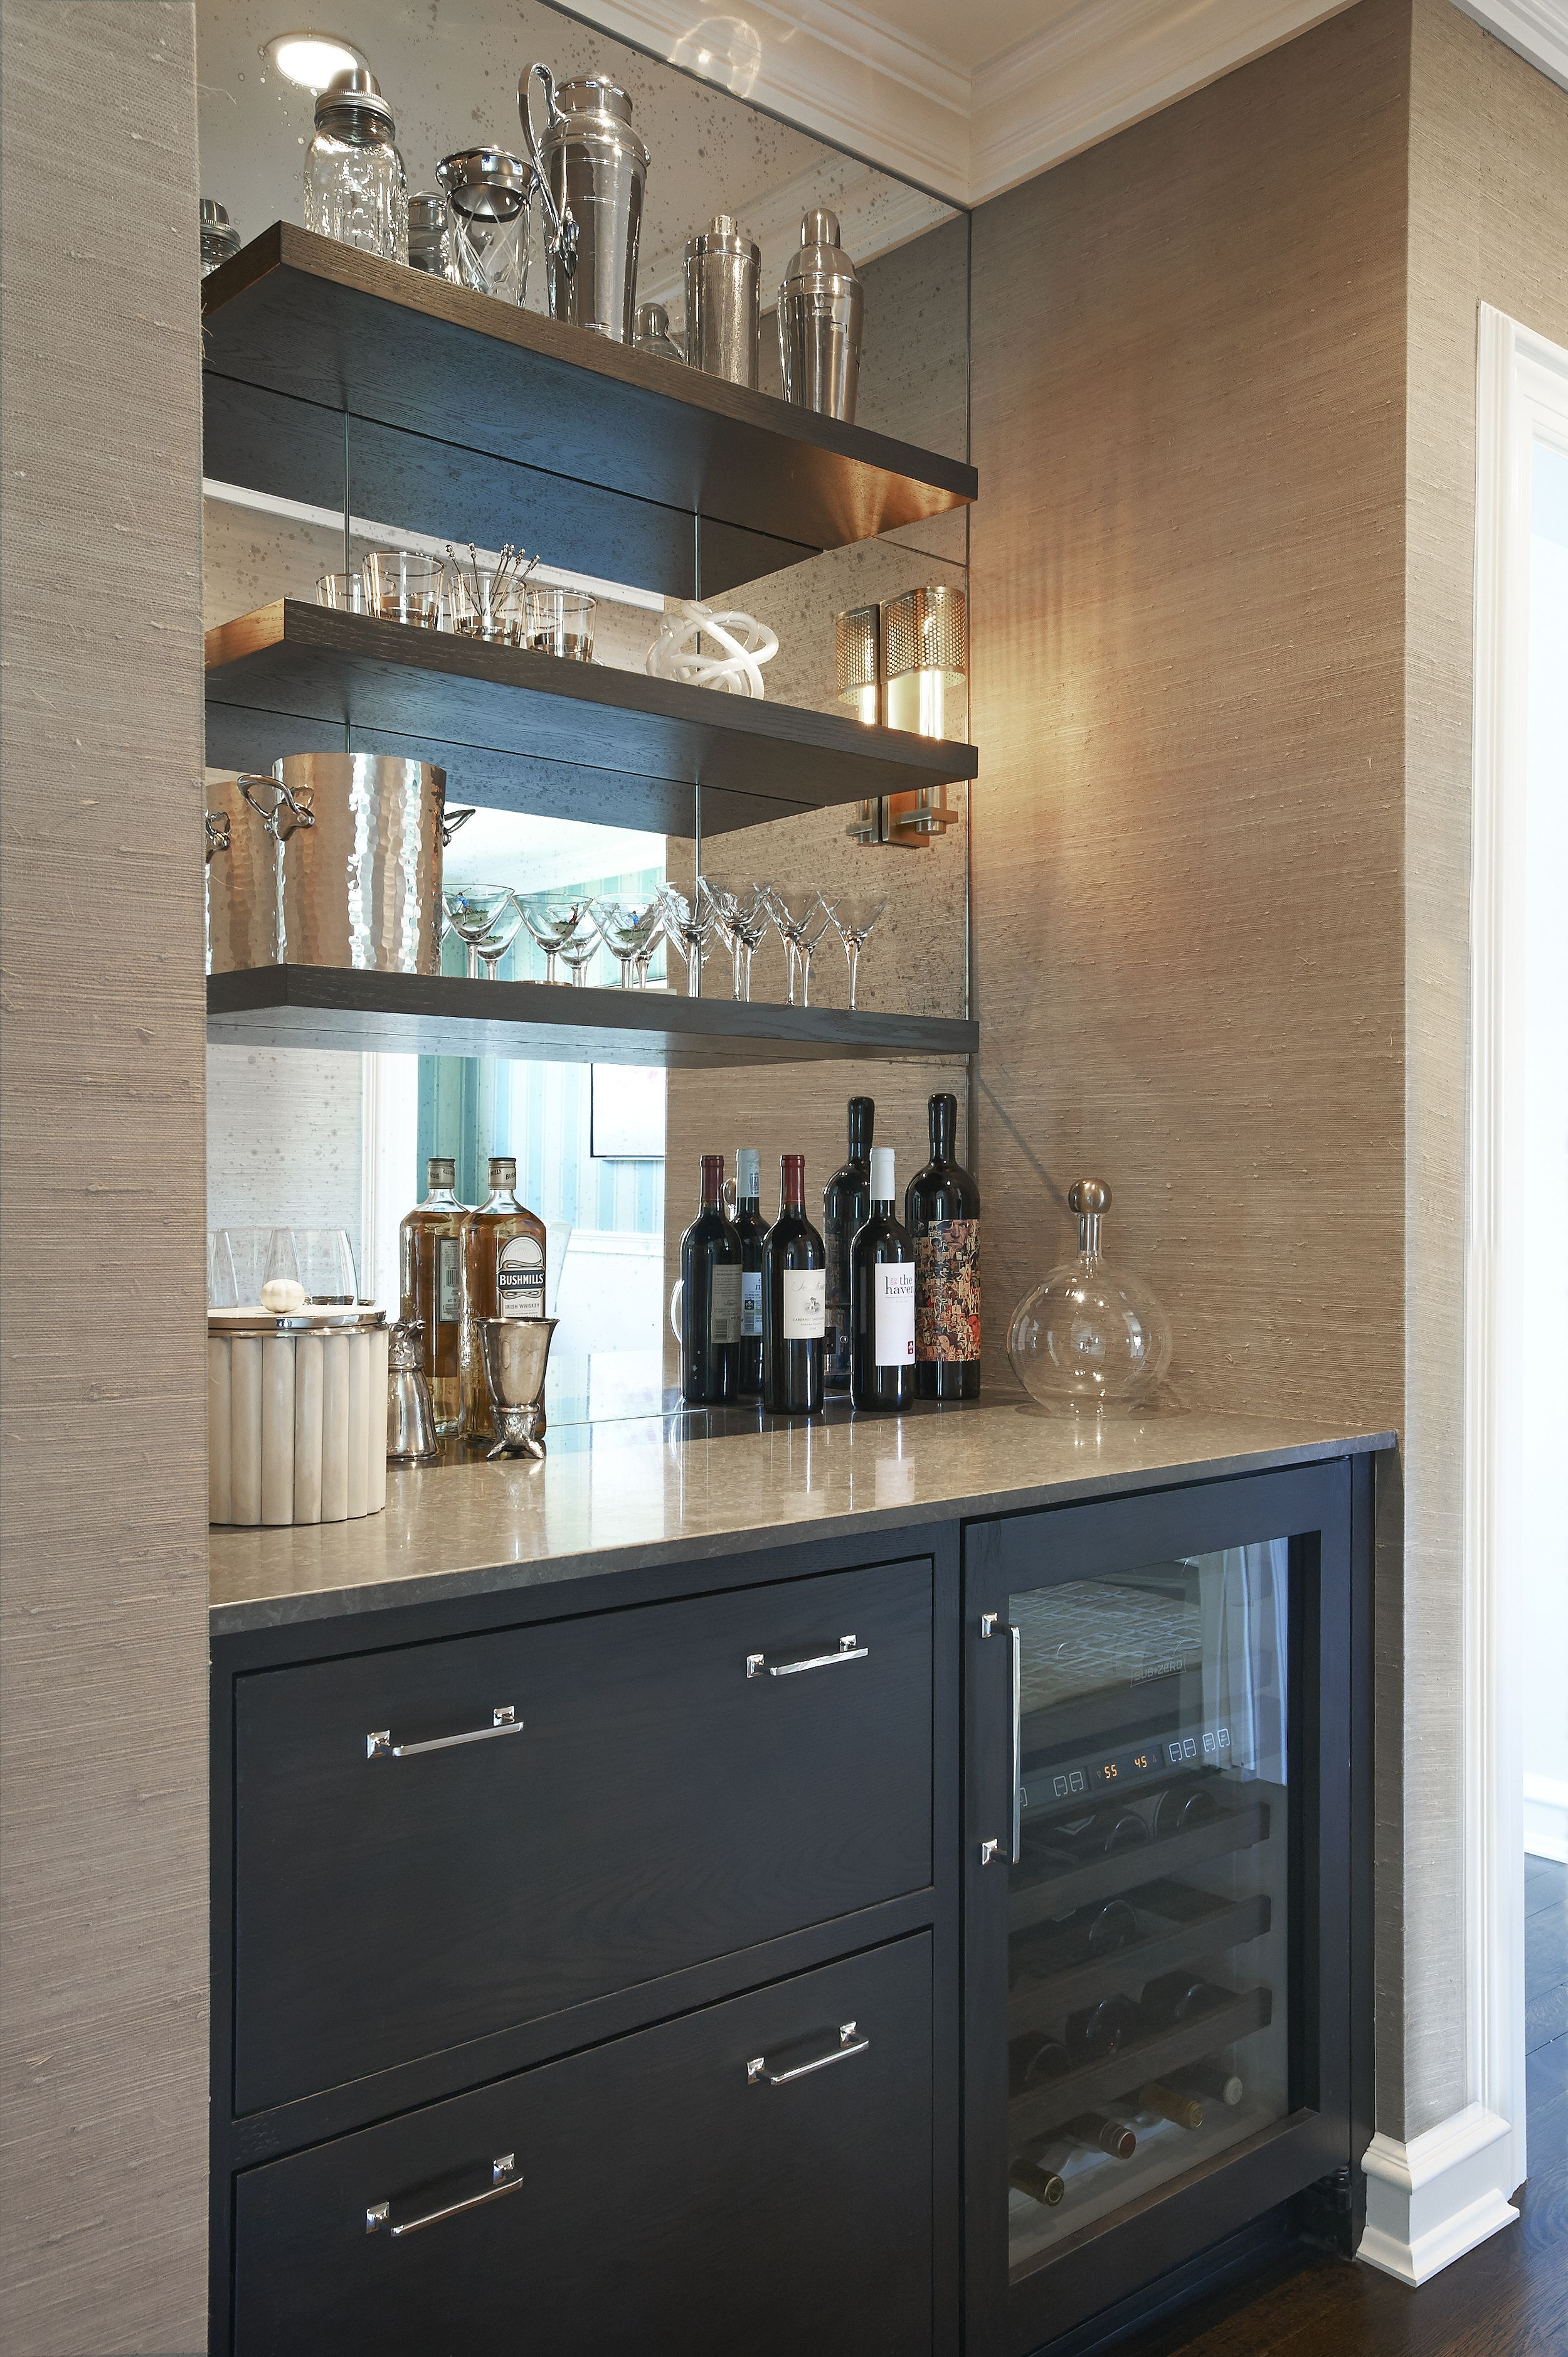 7 Surprising Tips Floating Shelf Below Tv Bedrooms Floating Shelves Books Reading Corners Staggered Floating S Modern Home Bar Home Bar Decor Home Bar Designs